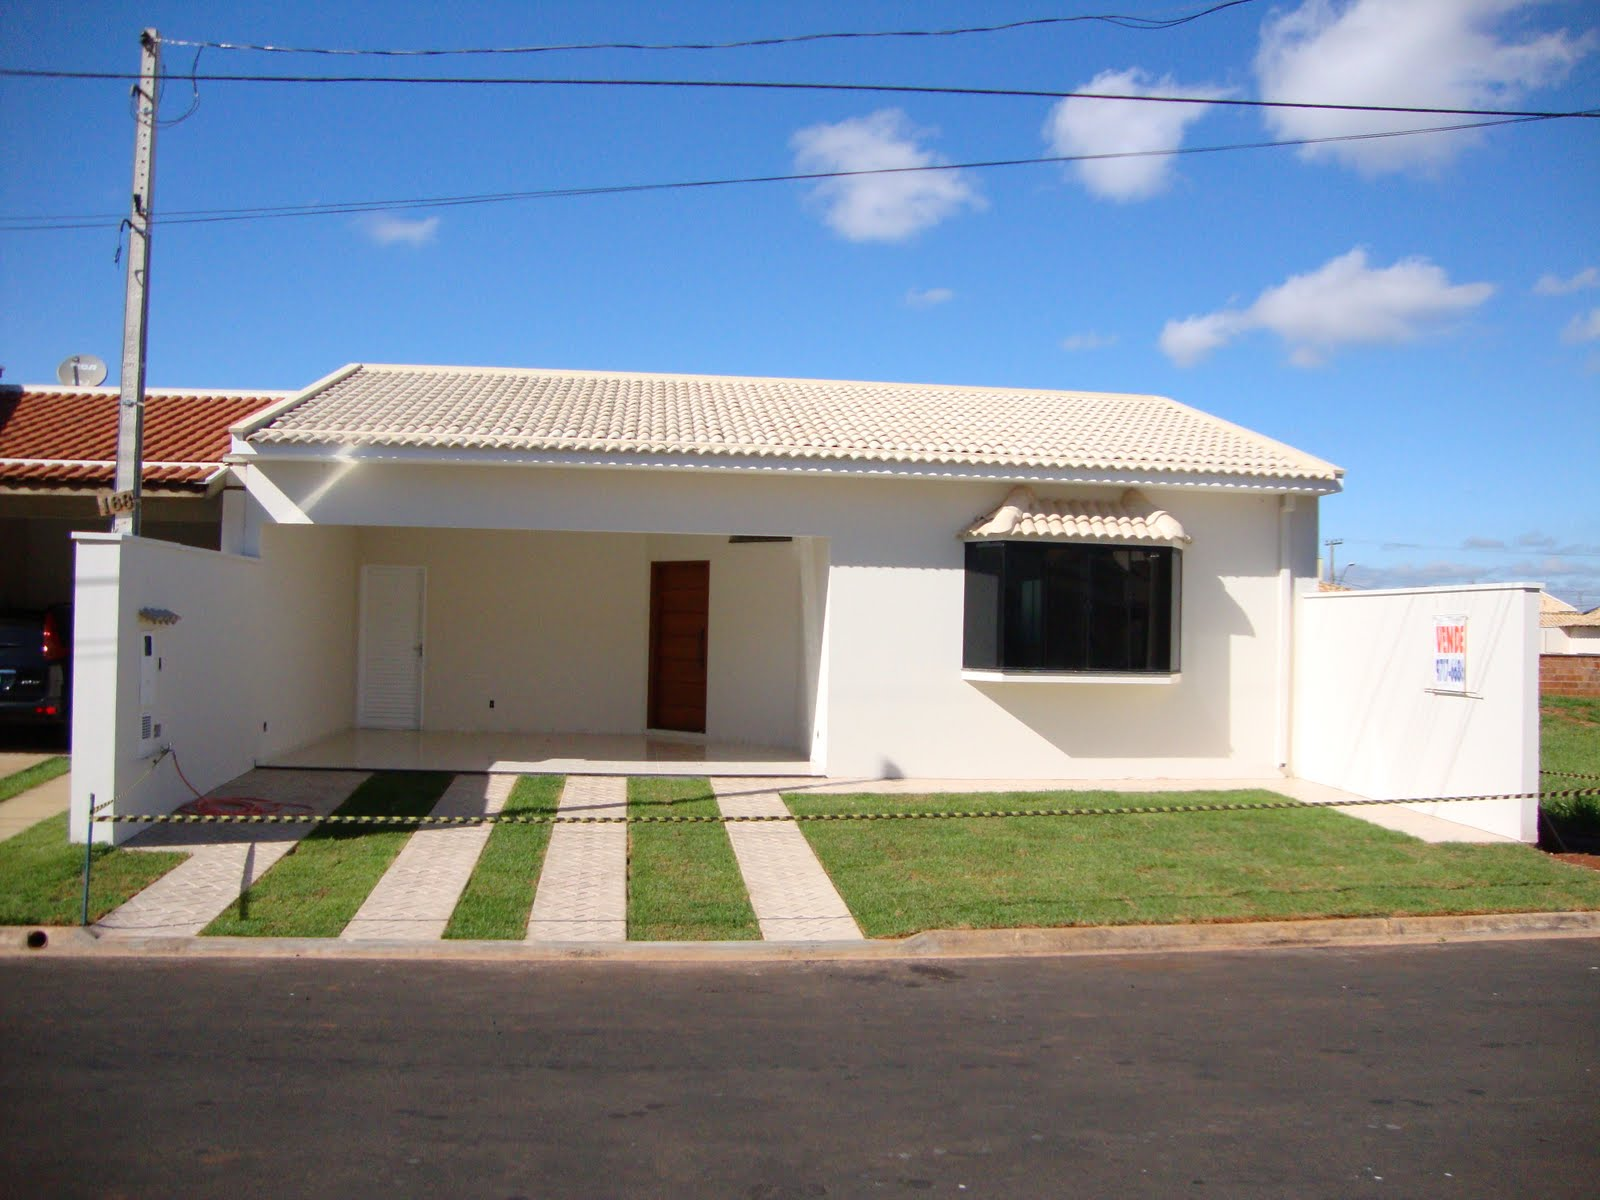 21 frentes de casas bonitas planos y fachadas todo for Ver frentes de casas modernas